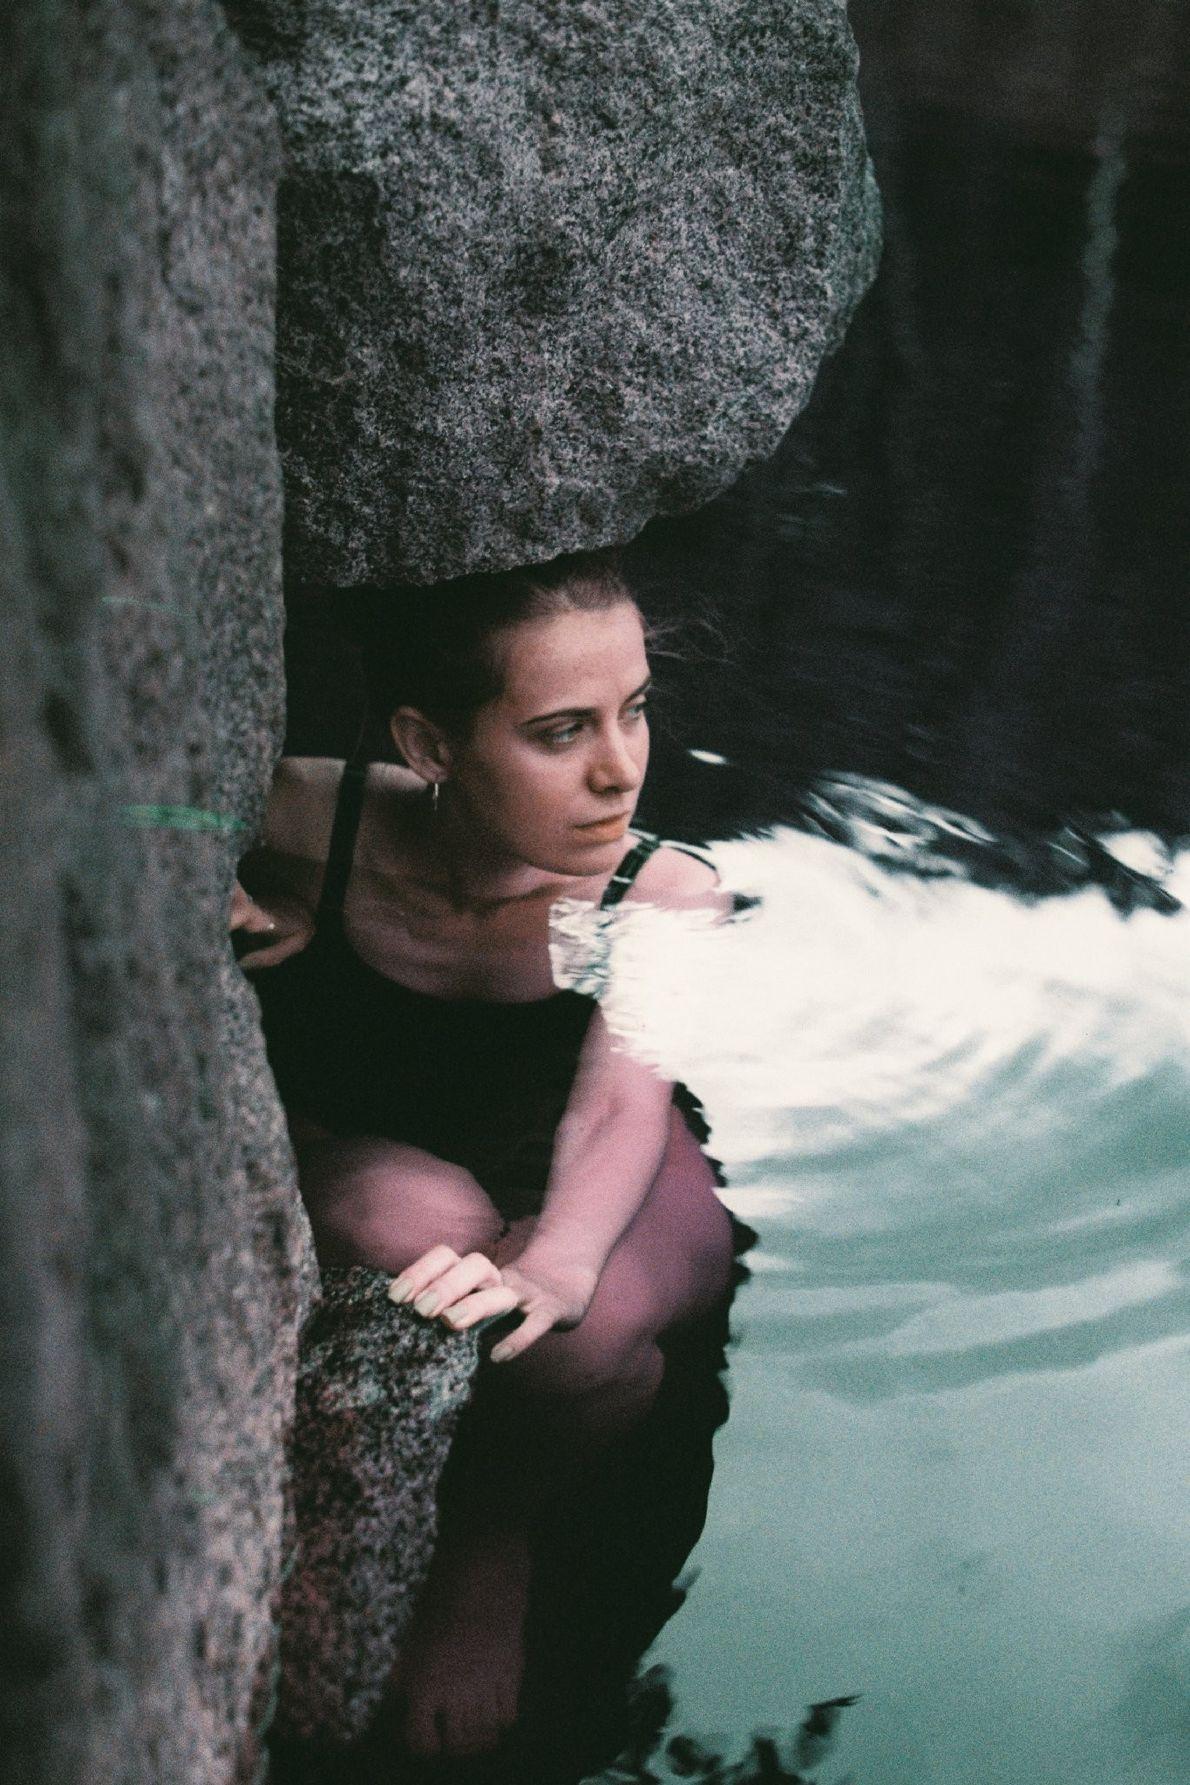 Your Shot photographer Yuliana Paranko made this portrait of Nastya in a quarry in Trygirya, Ukraine ...